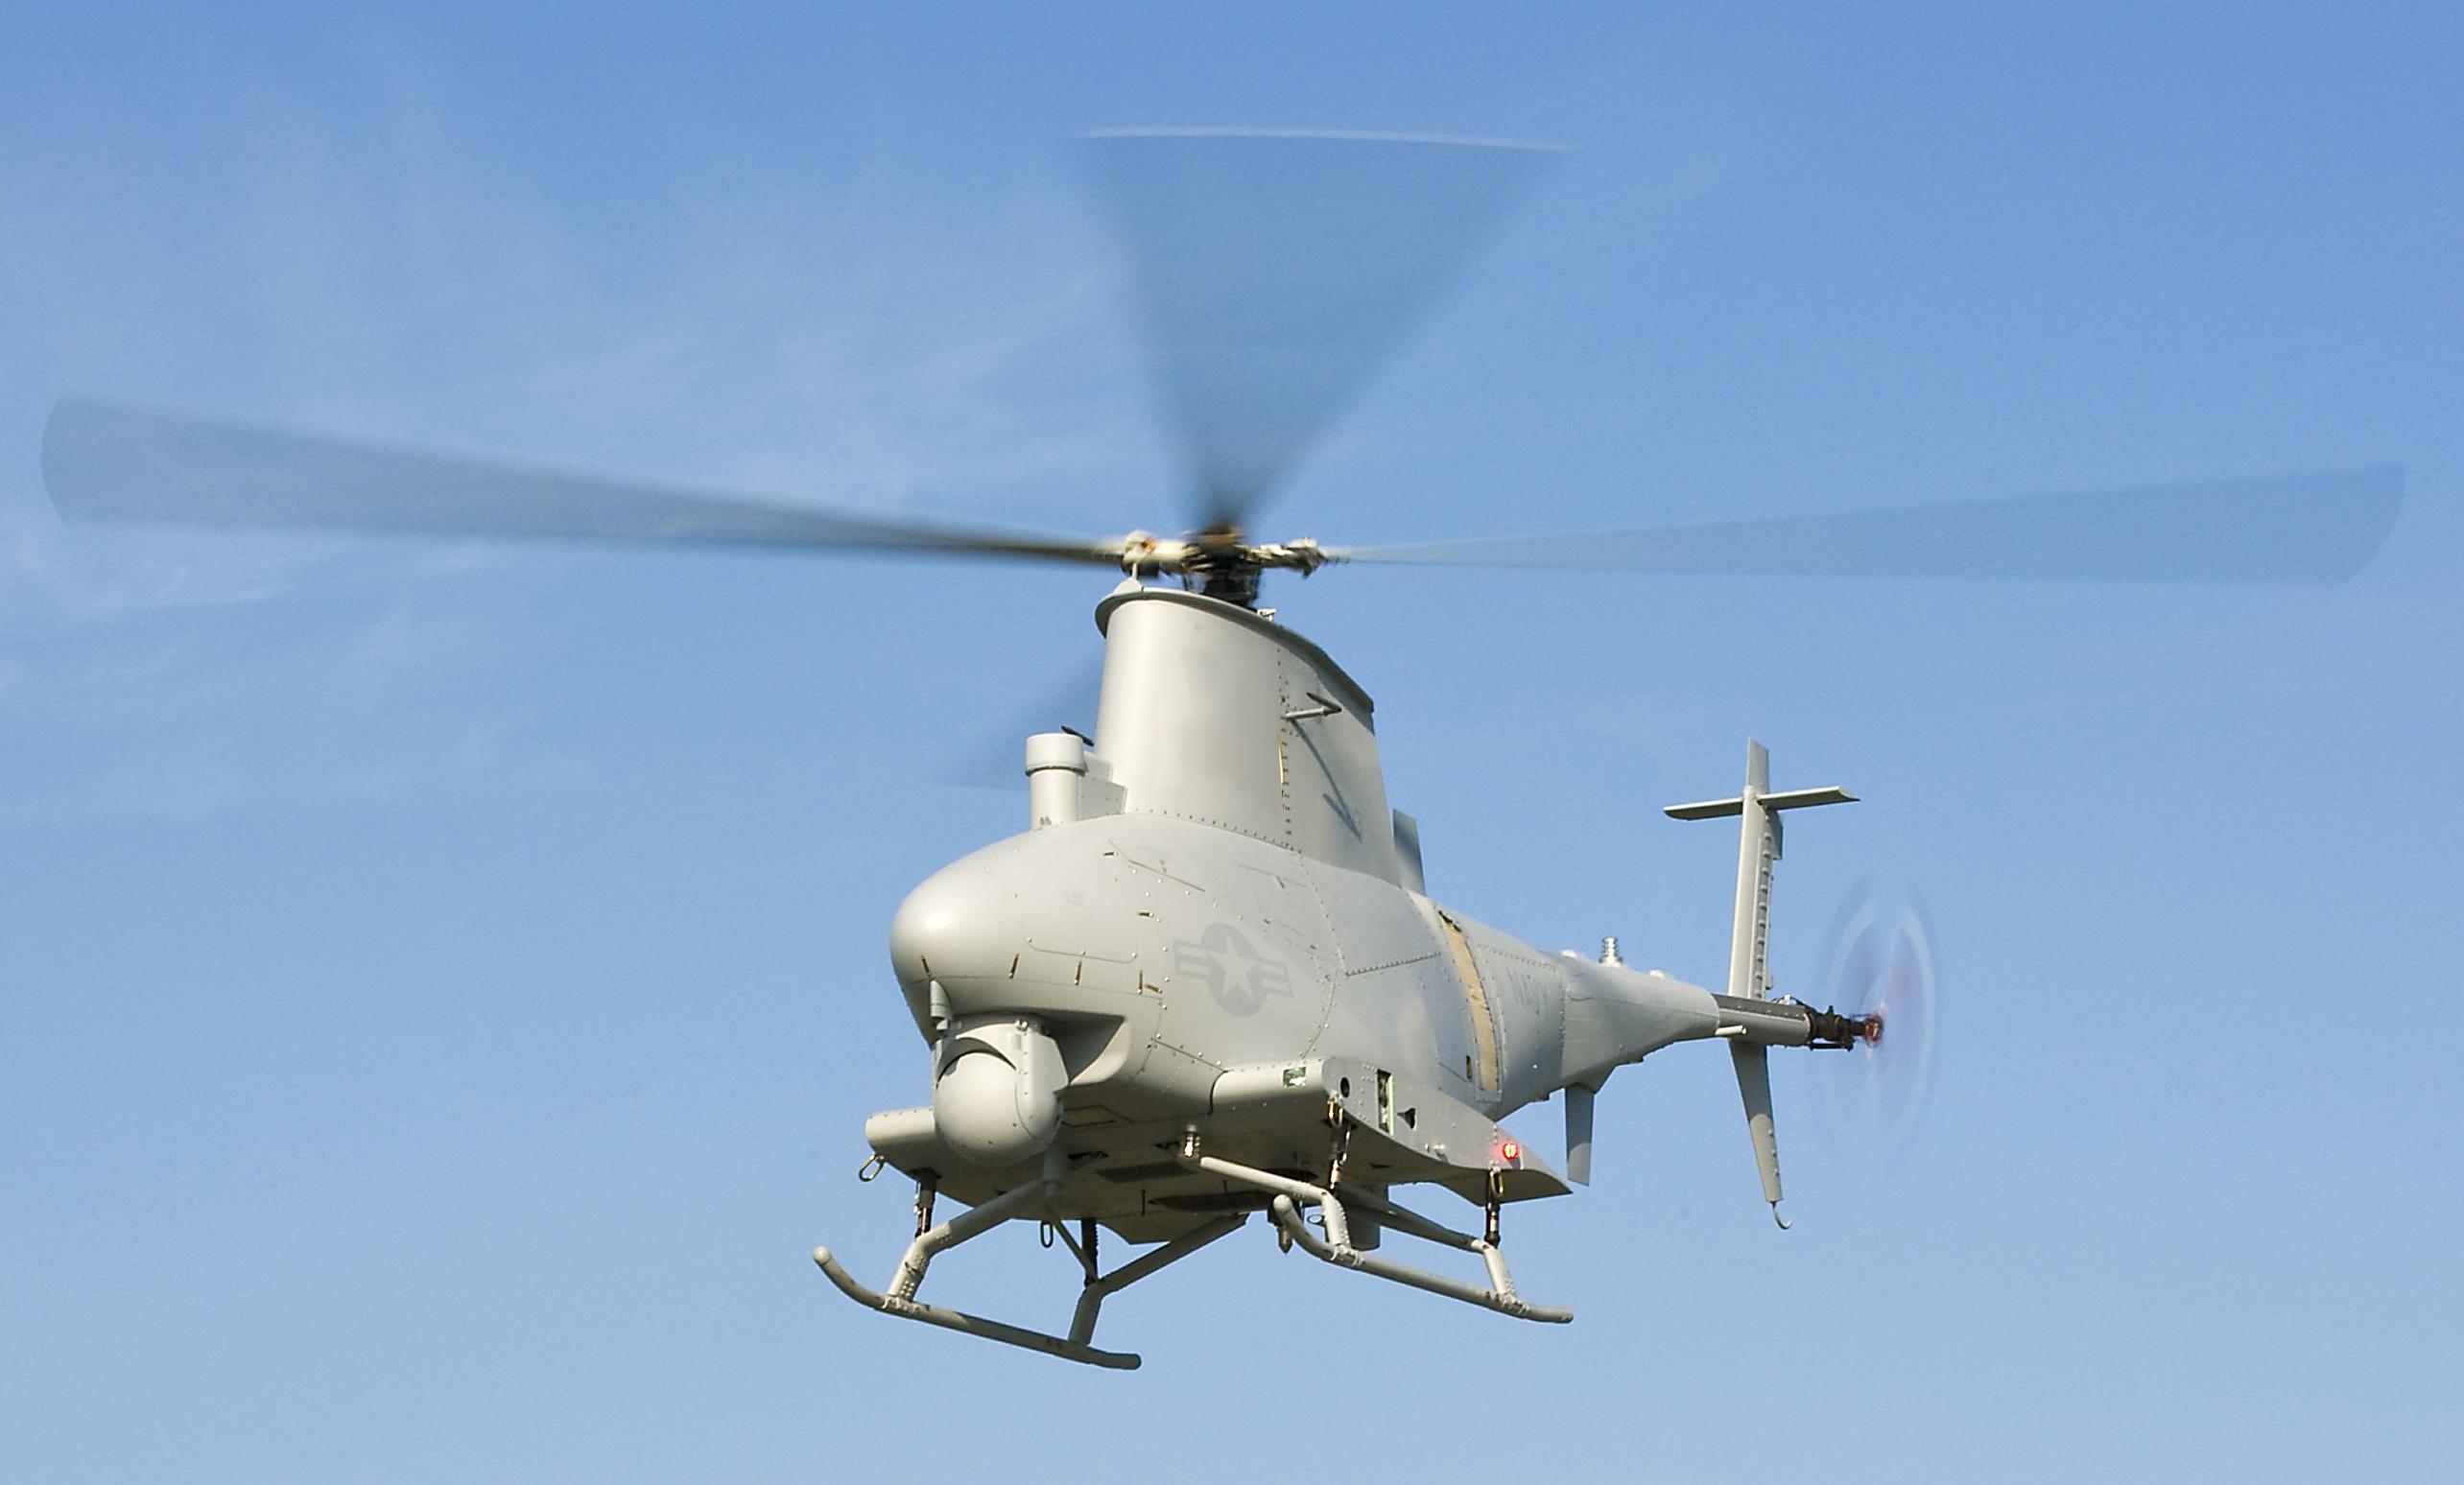 drone thermique rc